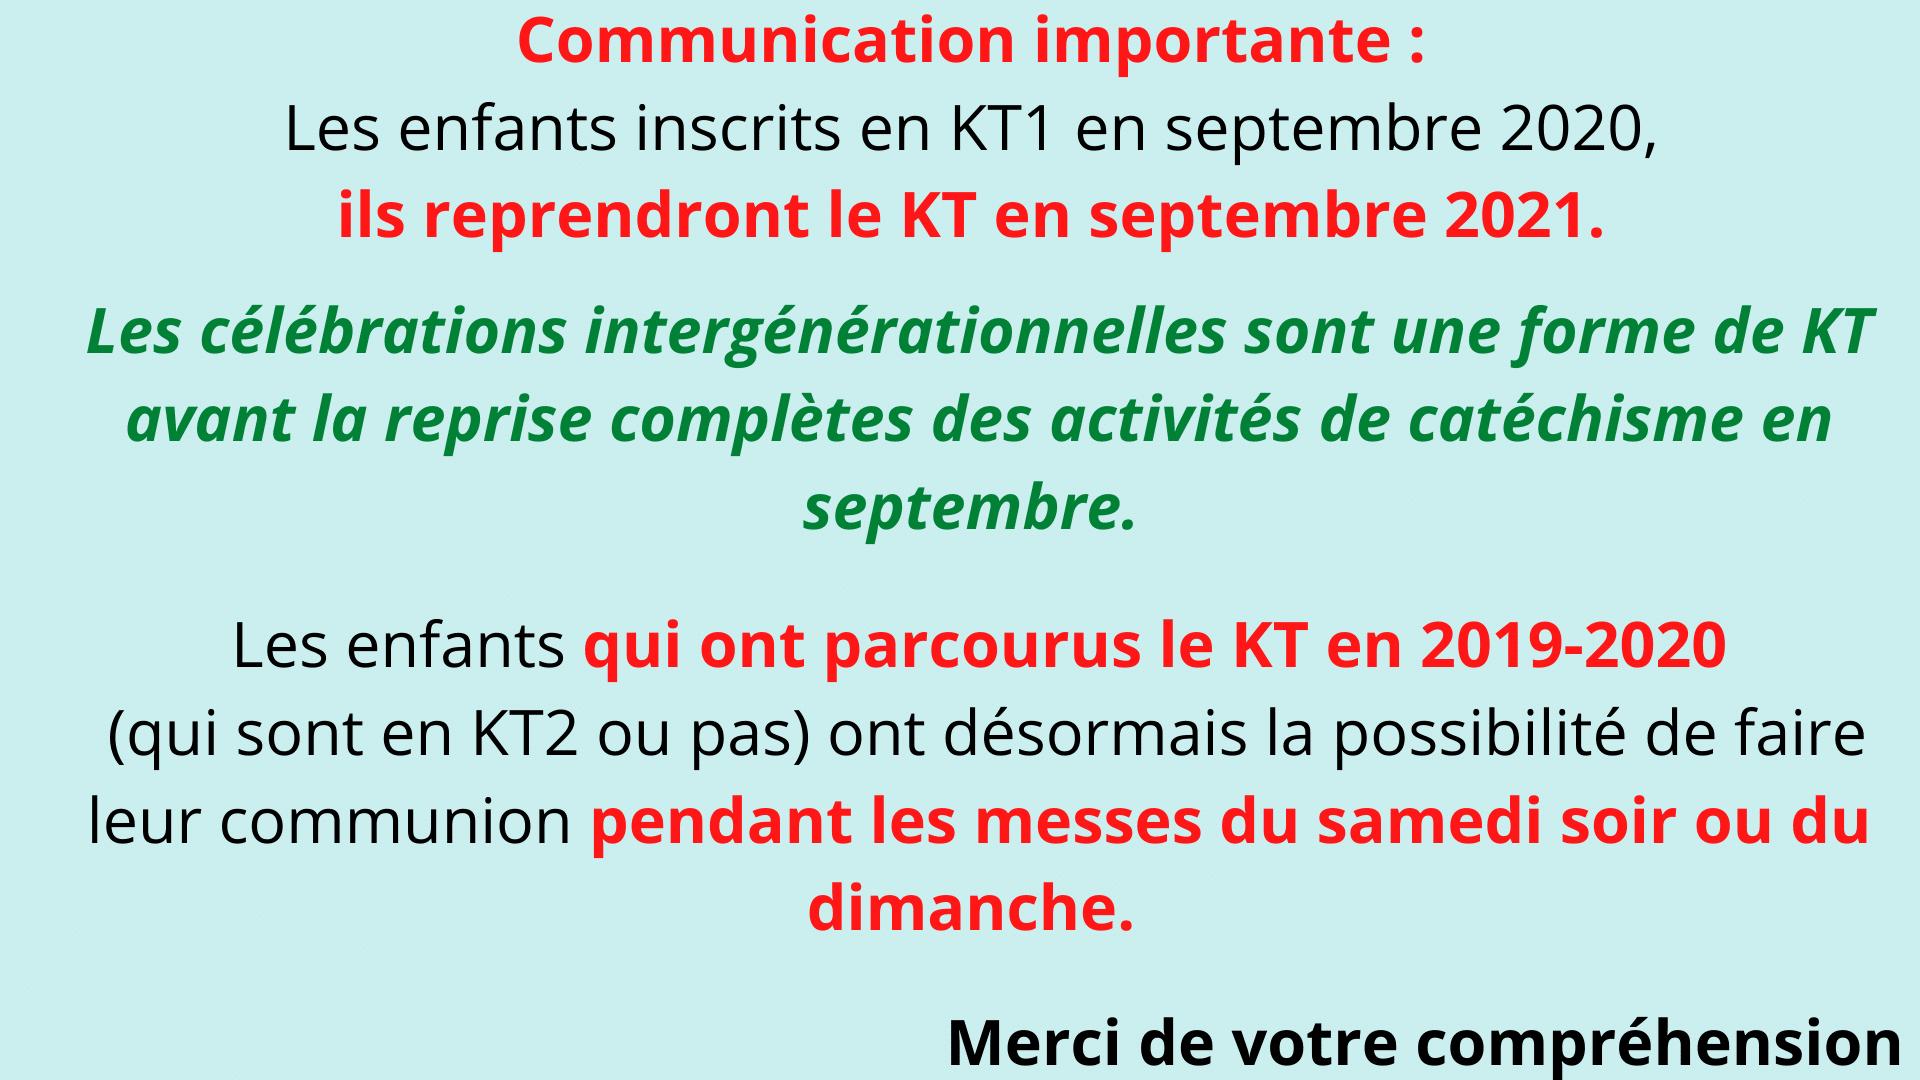 Communication importante KT1